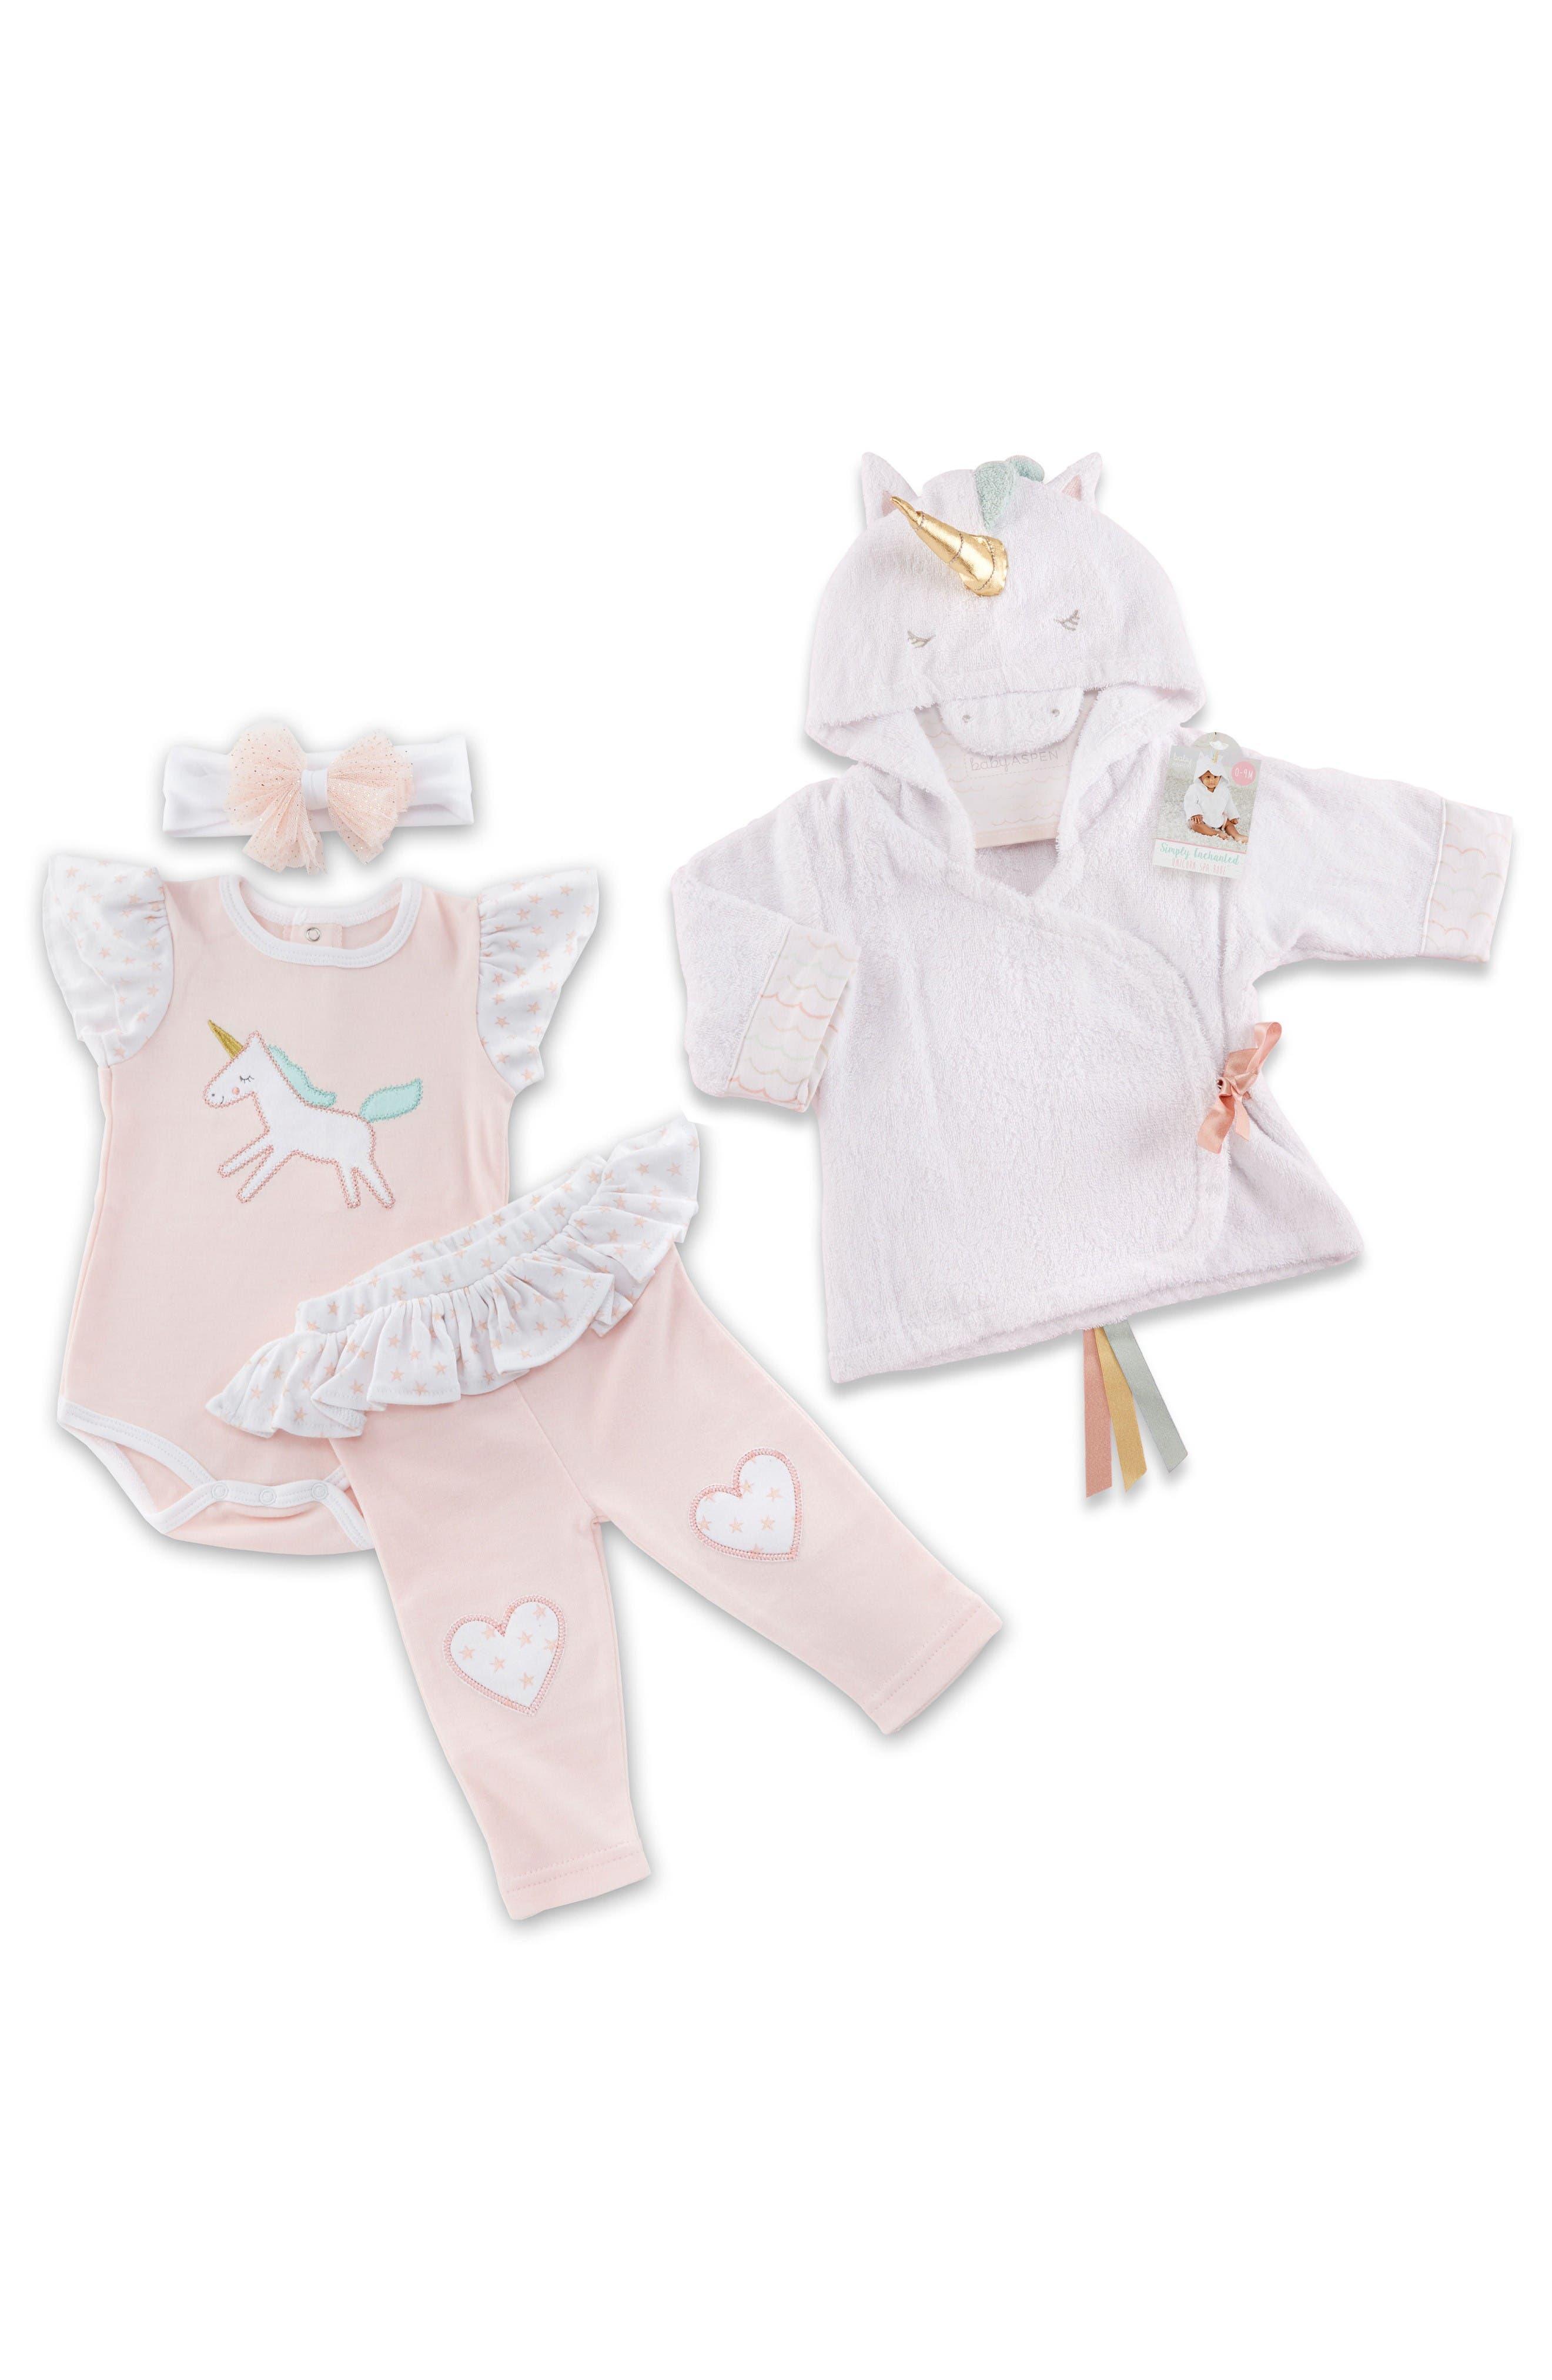 Main Image - Baby Aspen Simply Enchanted Unicorn Spa 4-Piece Gift Set (Baby Girls)